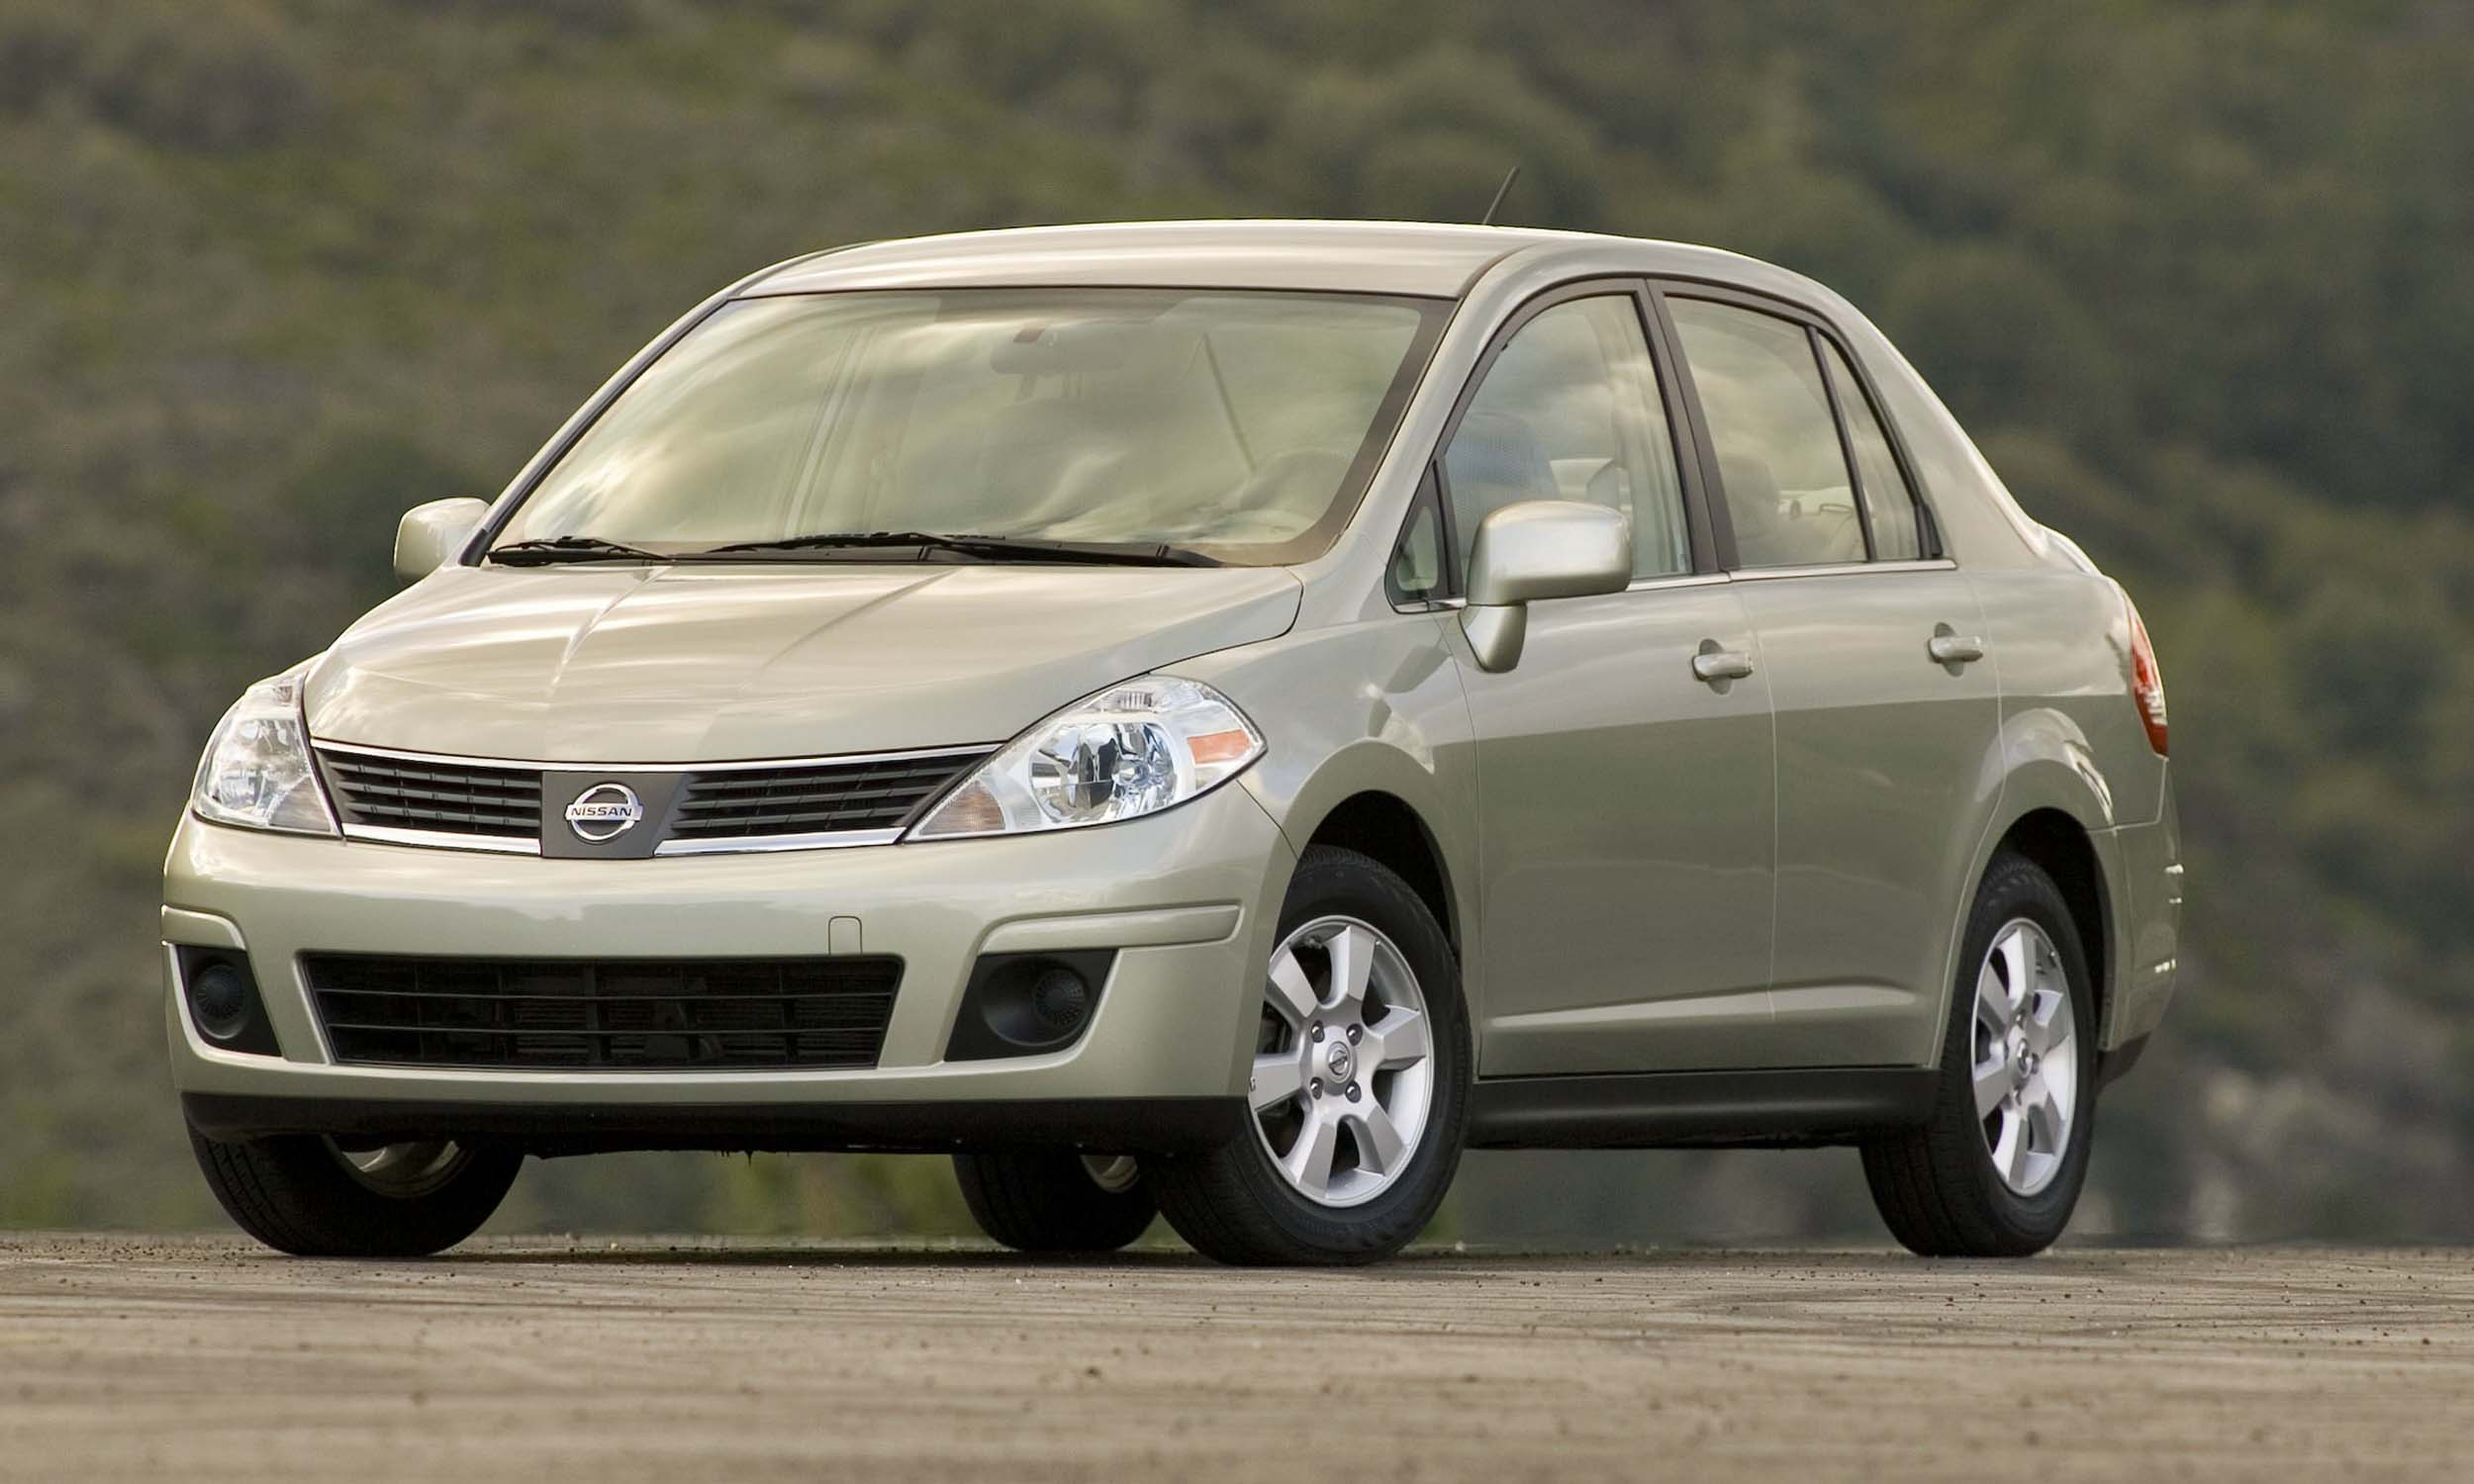 2009 Nissan Versa4?utm_source=rss&utm_medium=rss latest automotive safety recalls autonxt  at bayanpartner.co